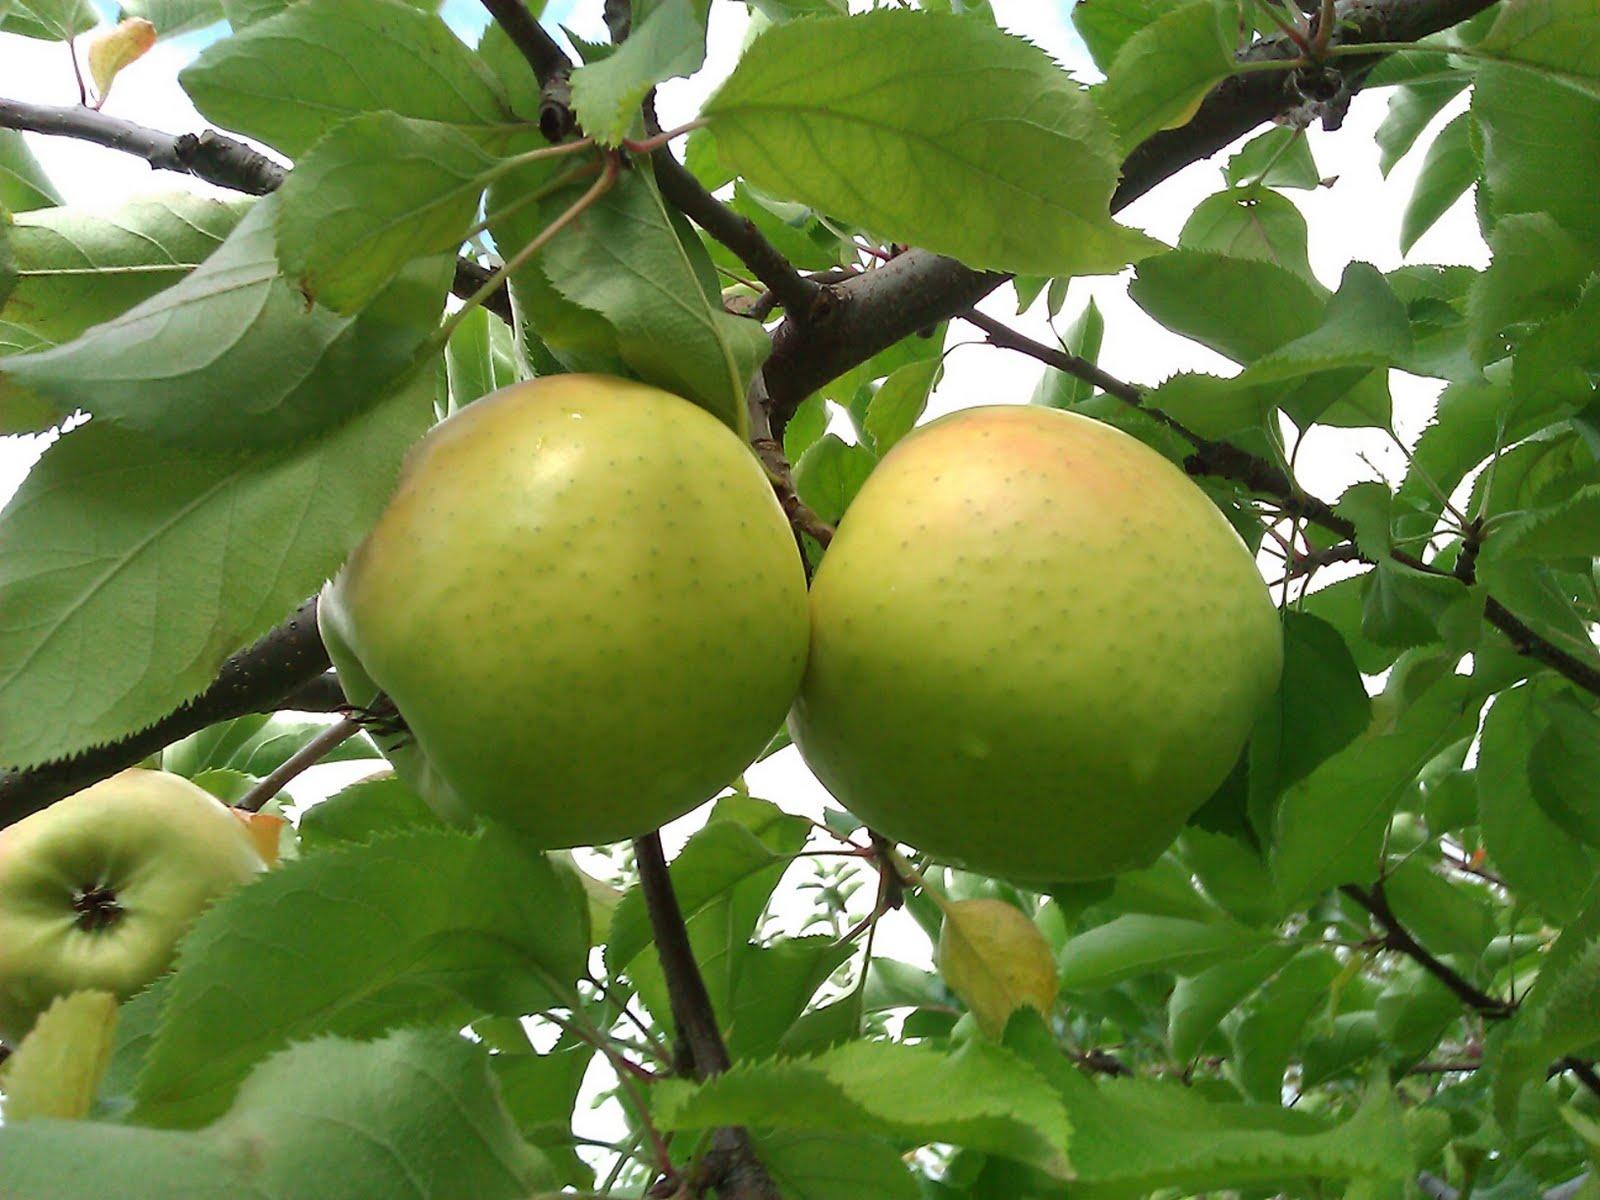 Apple 'Mutsu'-1446